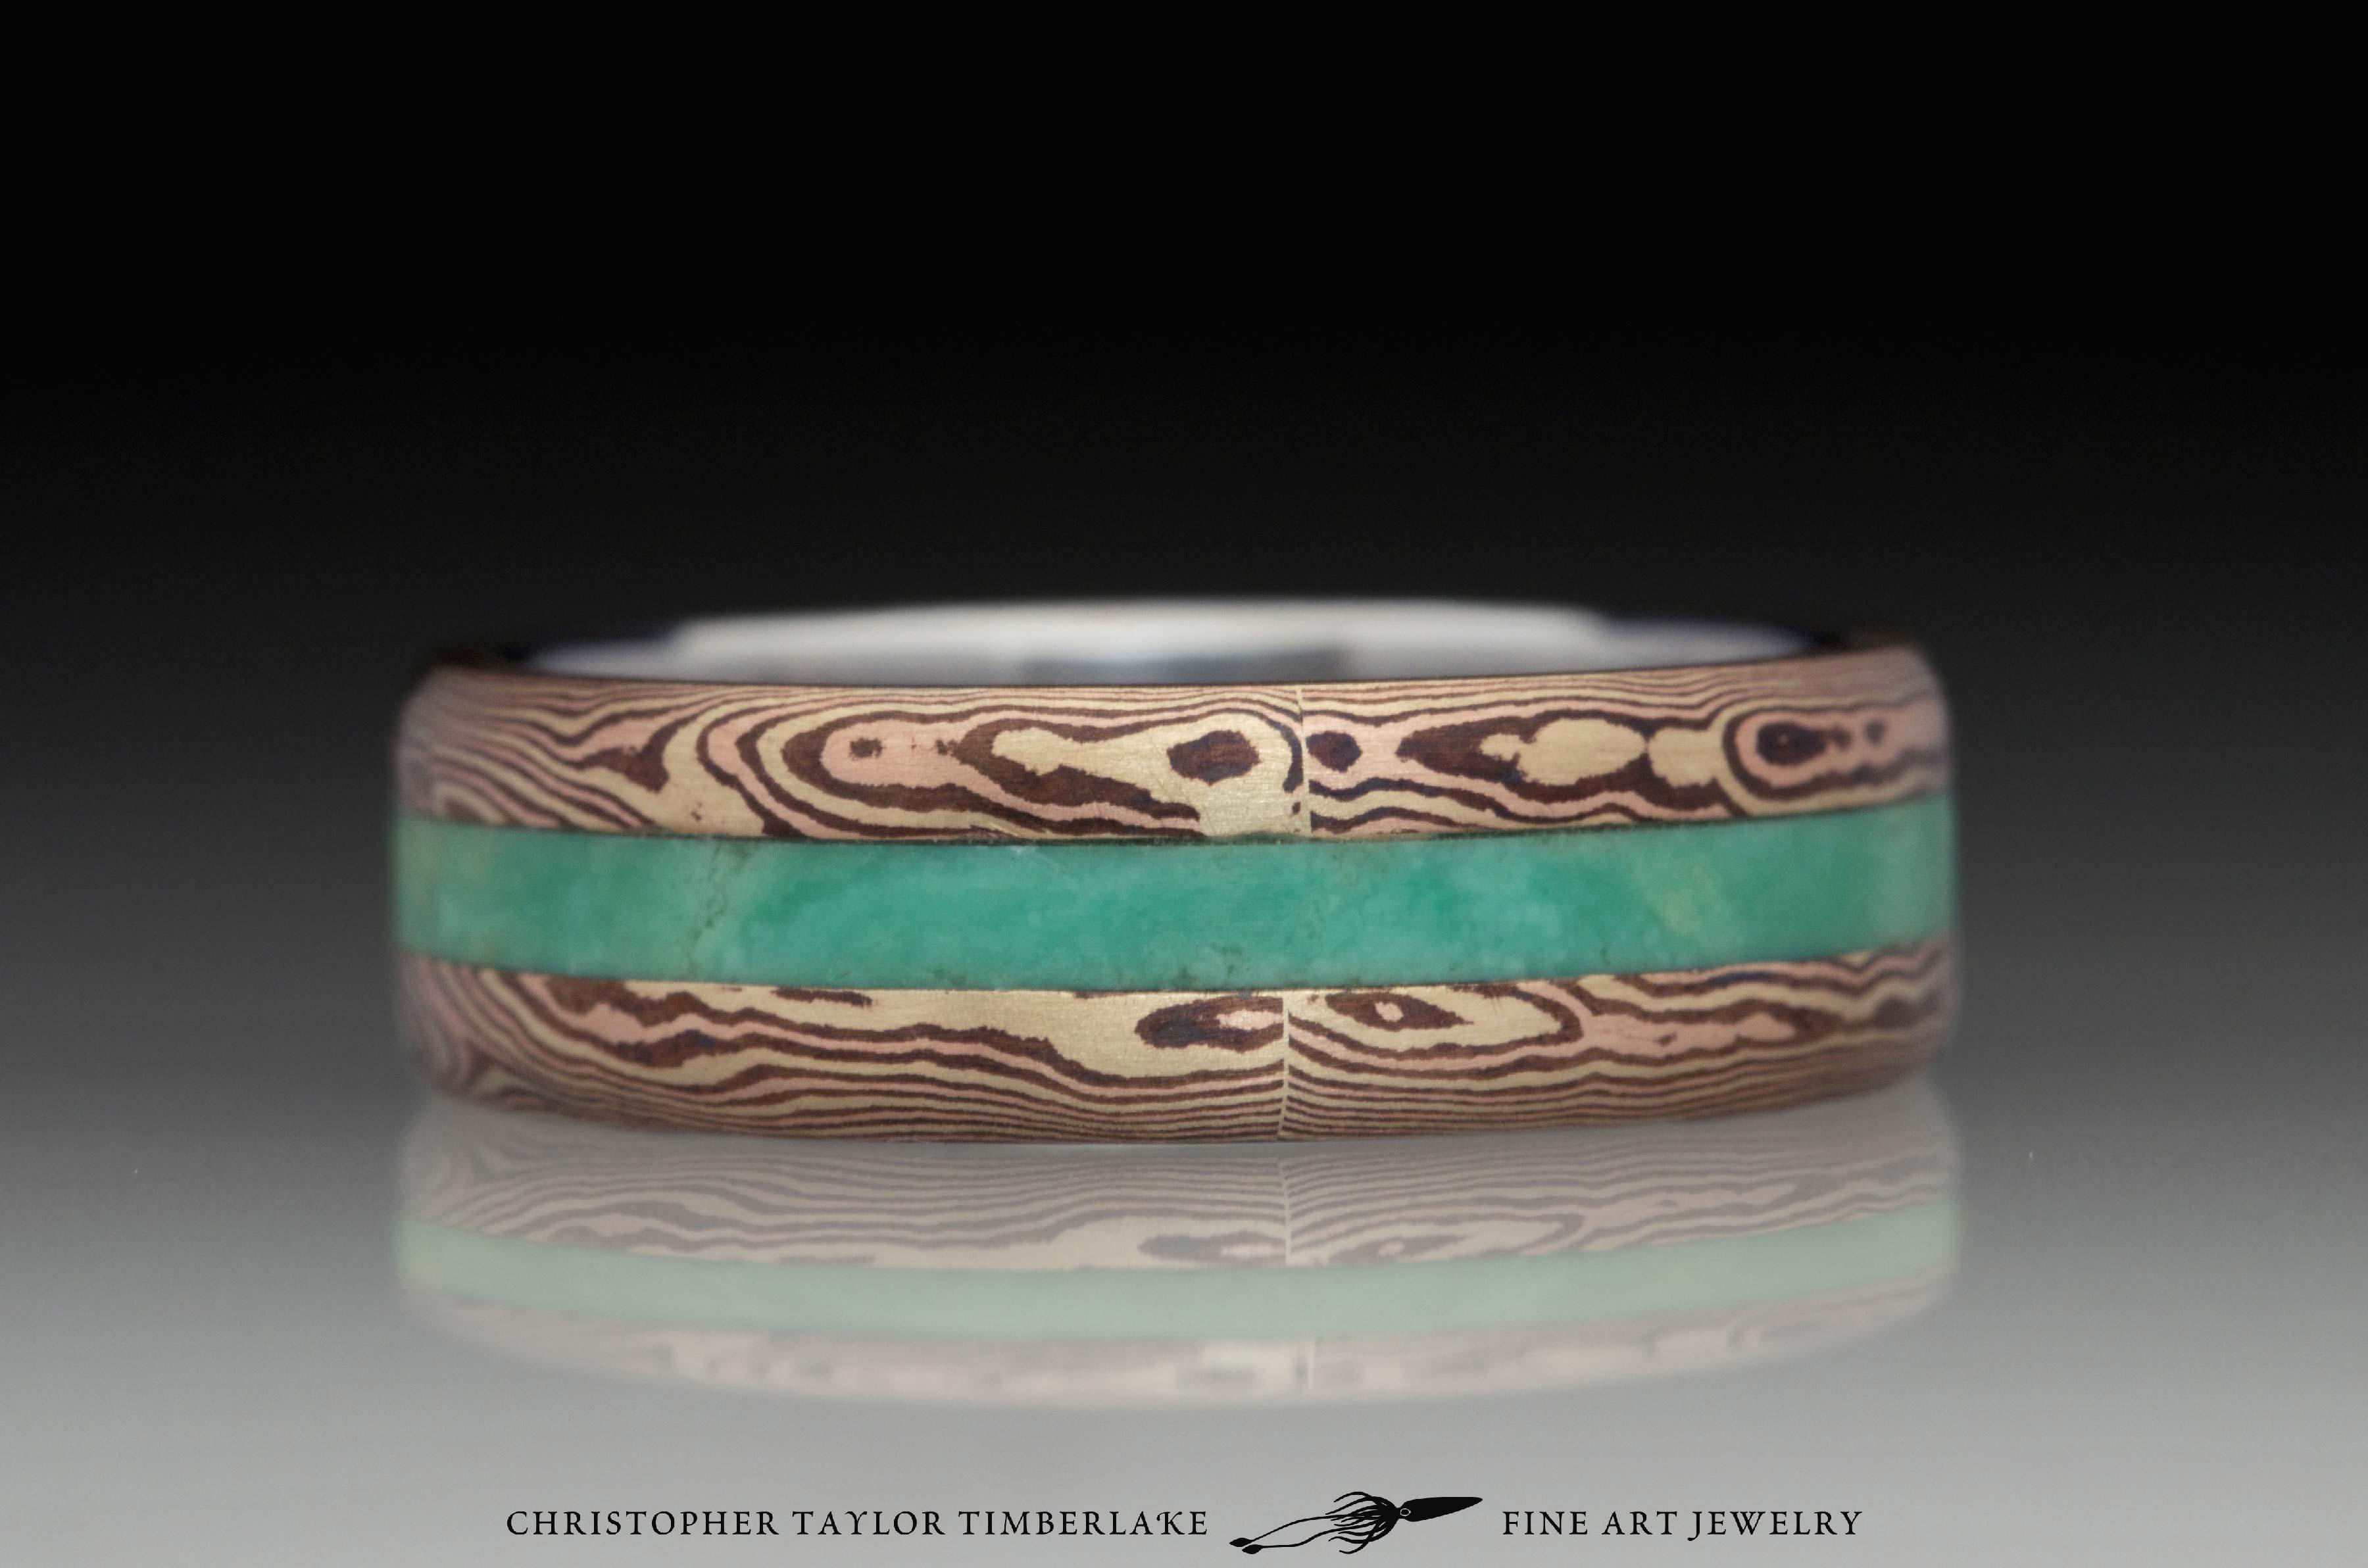 Mokumé-Mokume-Gane-Ring-(M84b)-14K-karat-yellow-gold,-14K-rose-gold,-shakudo-2k,-green-turquoise-inlay,-domed,-river-flow,-stainless-inner-band,-6mm-(2-2-2)–2